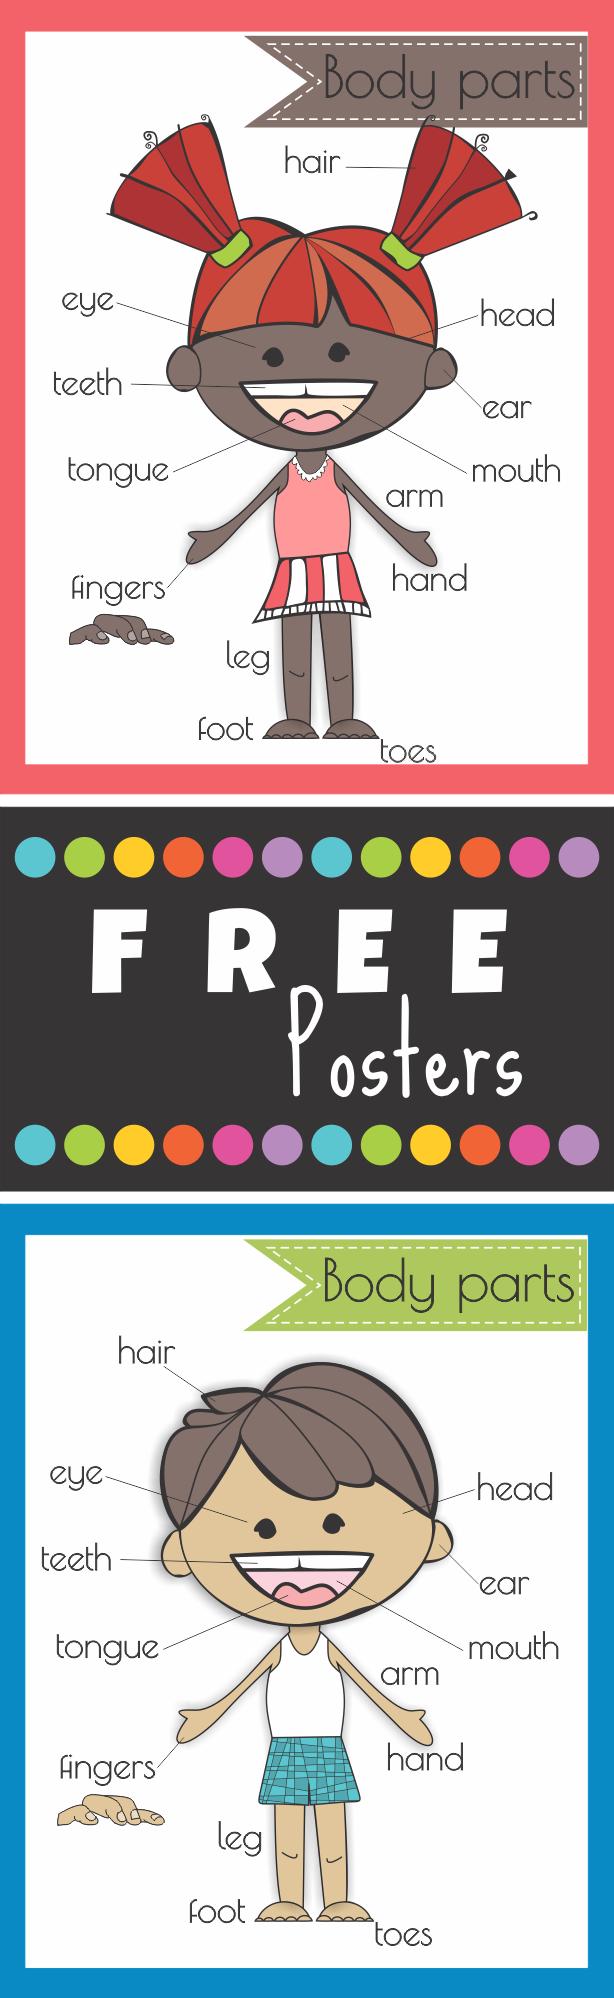 Free Body Parts Poster | Bulletin Board Ideas | Pinterest ...